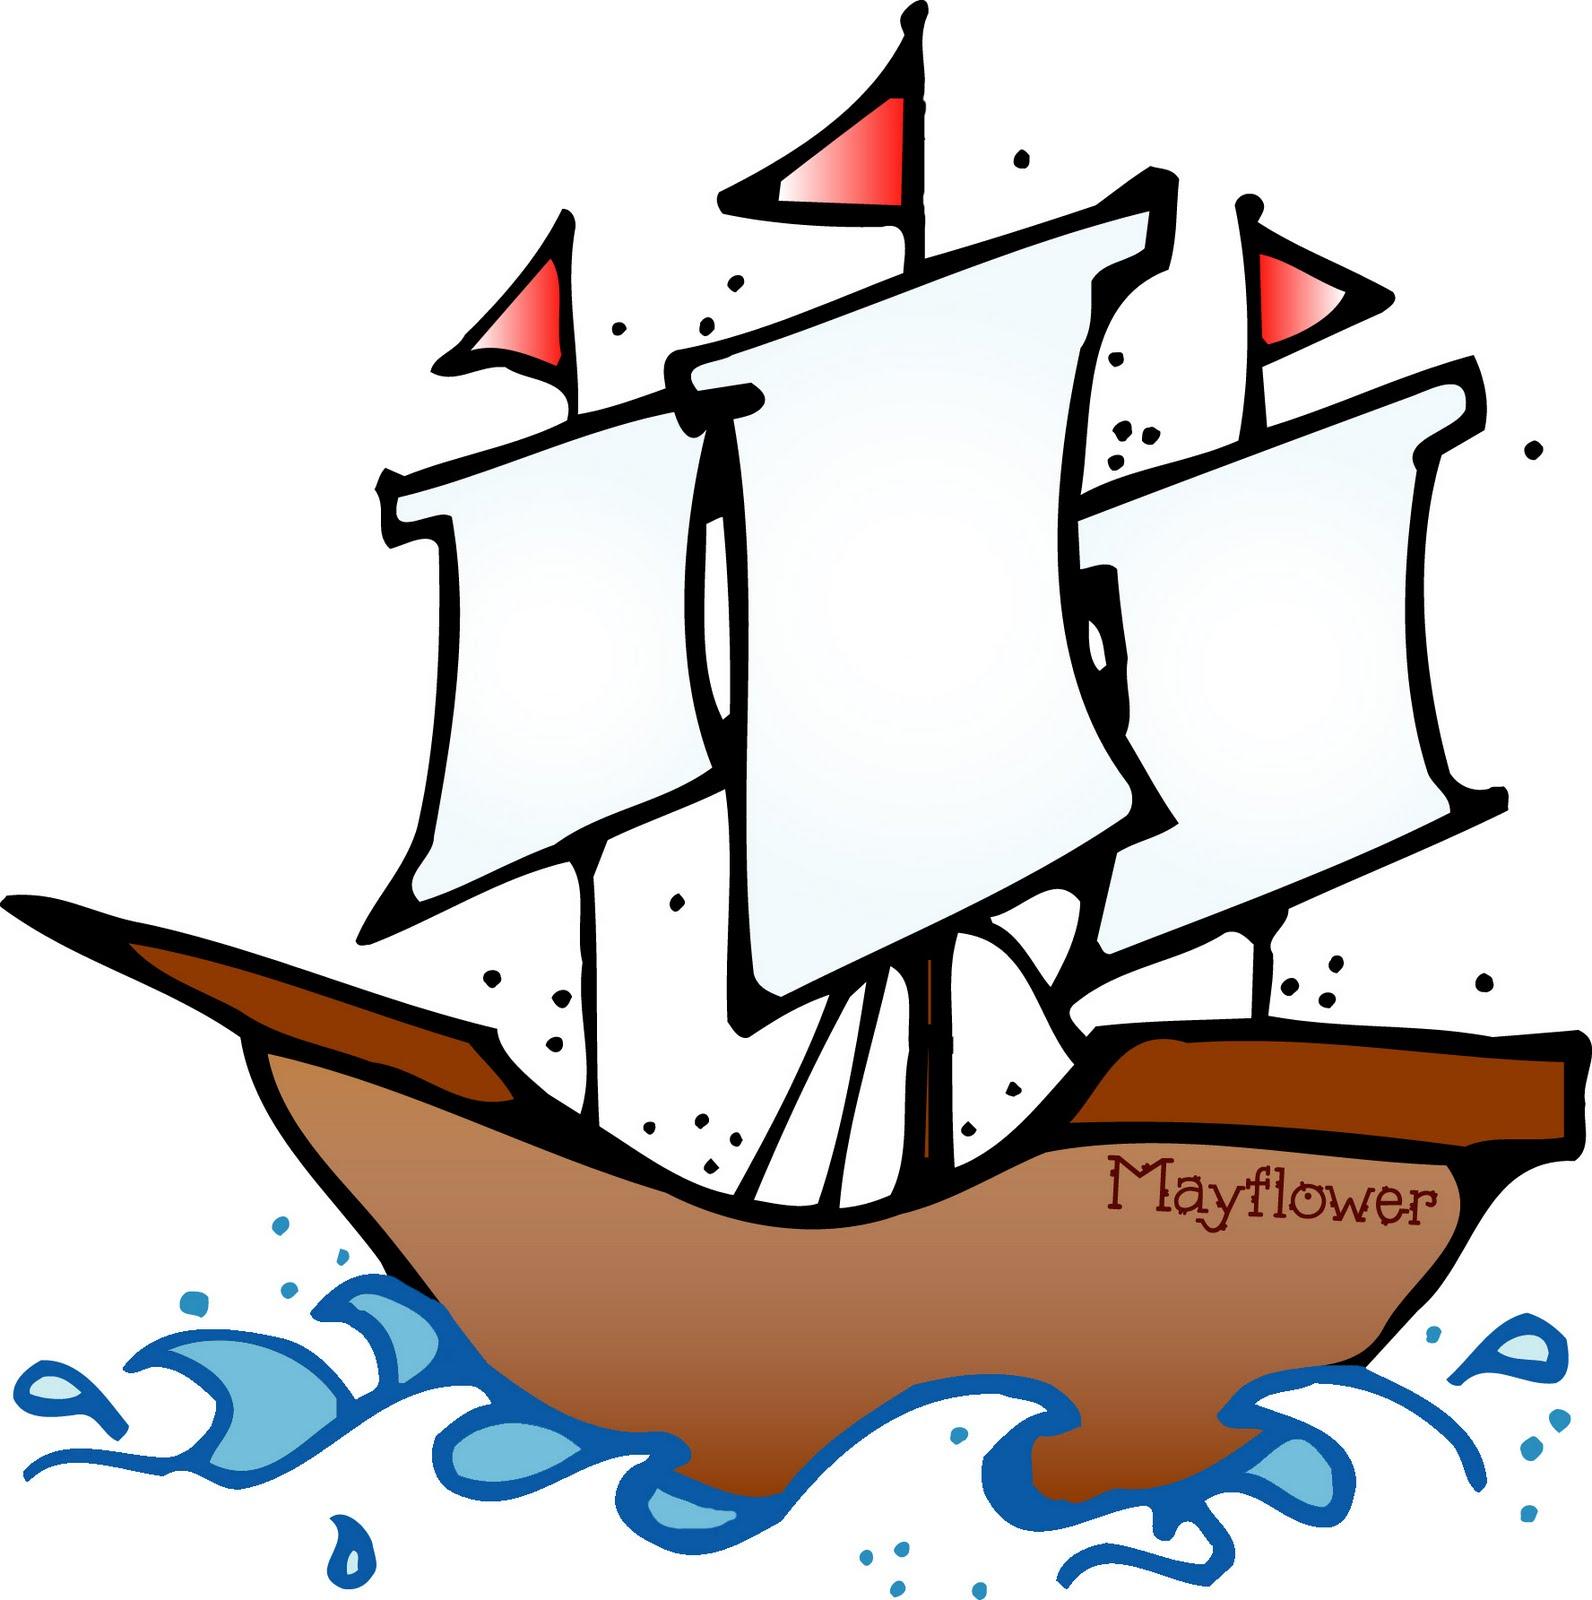 Pix For Mayflower Clipart-Pix For Mayflower Clipart-0